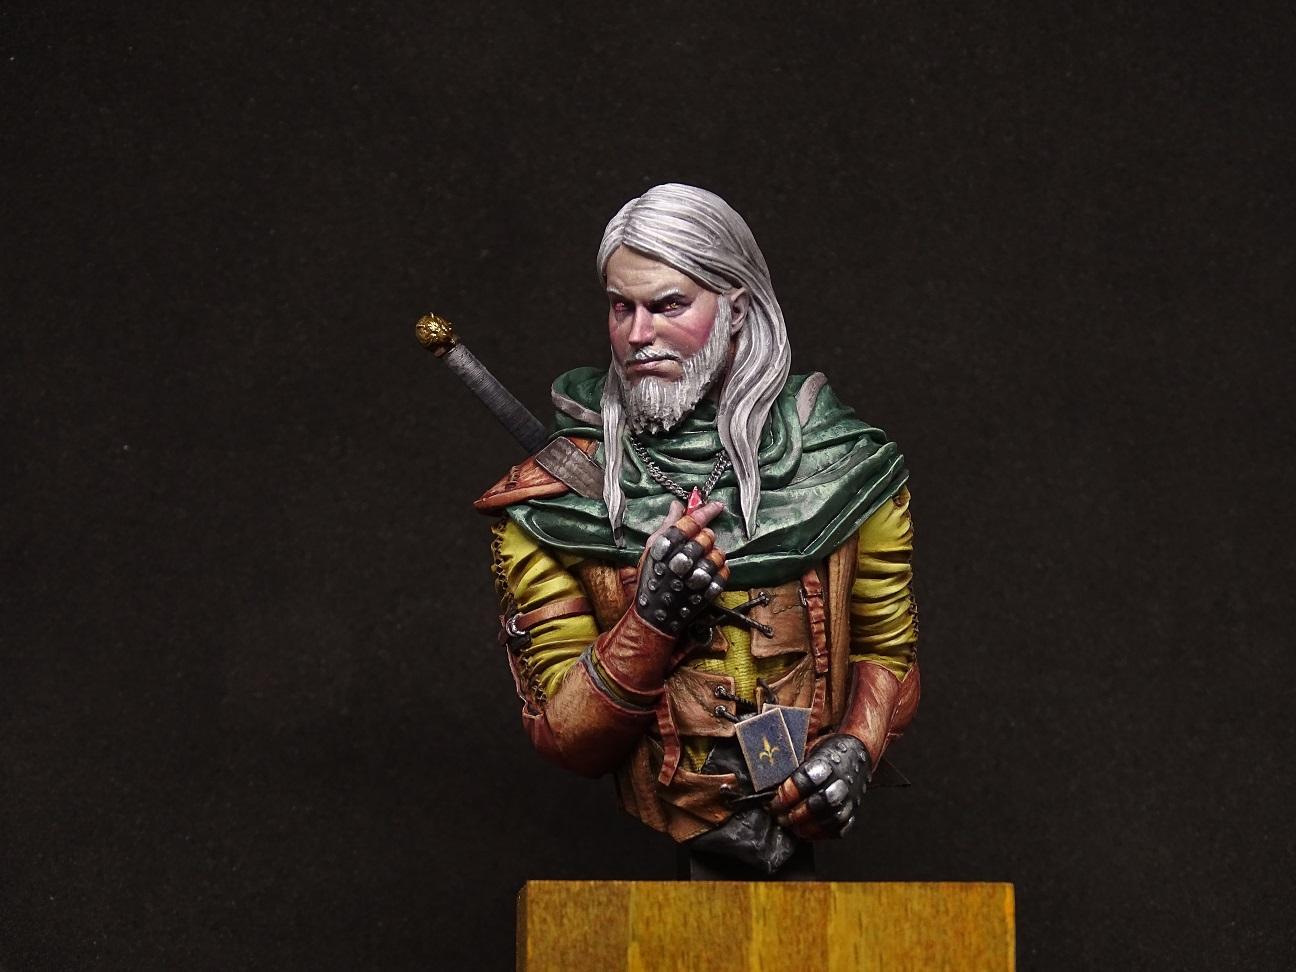 1/12, Bust, Gambler, Geralt, Leather, Skin, Witcher